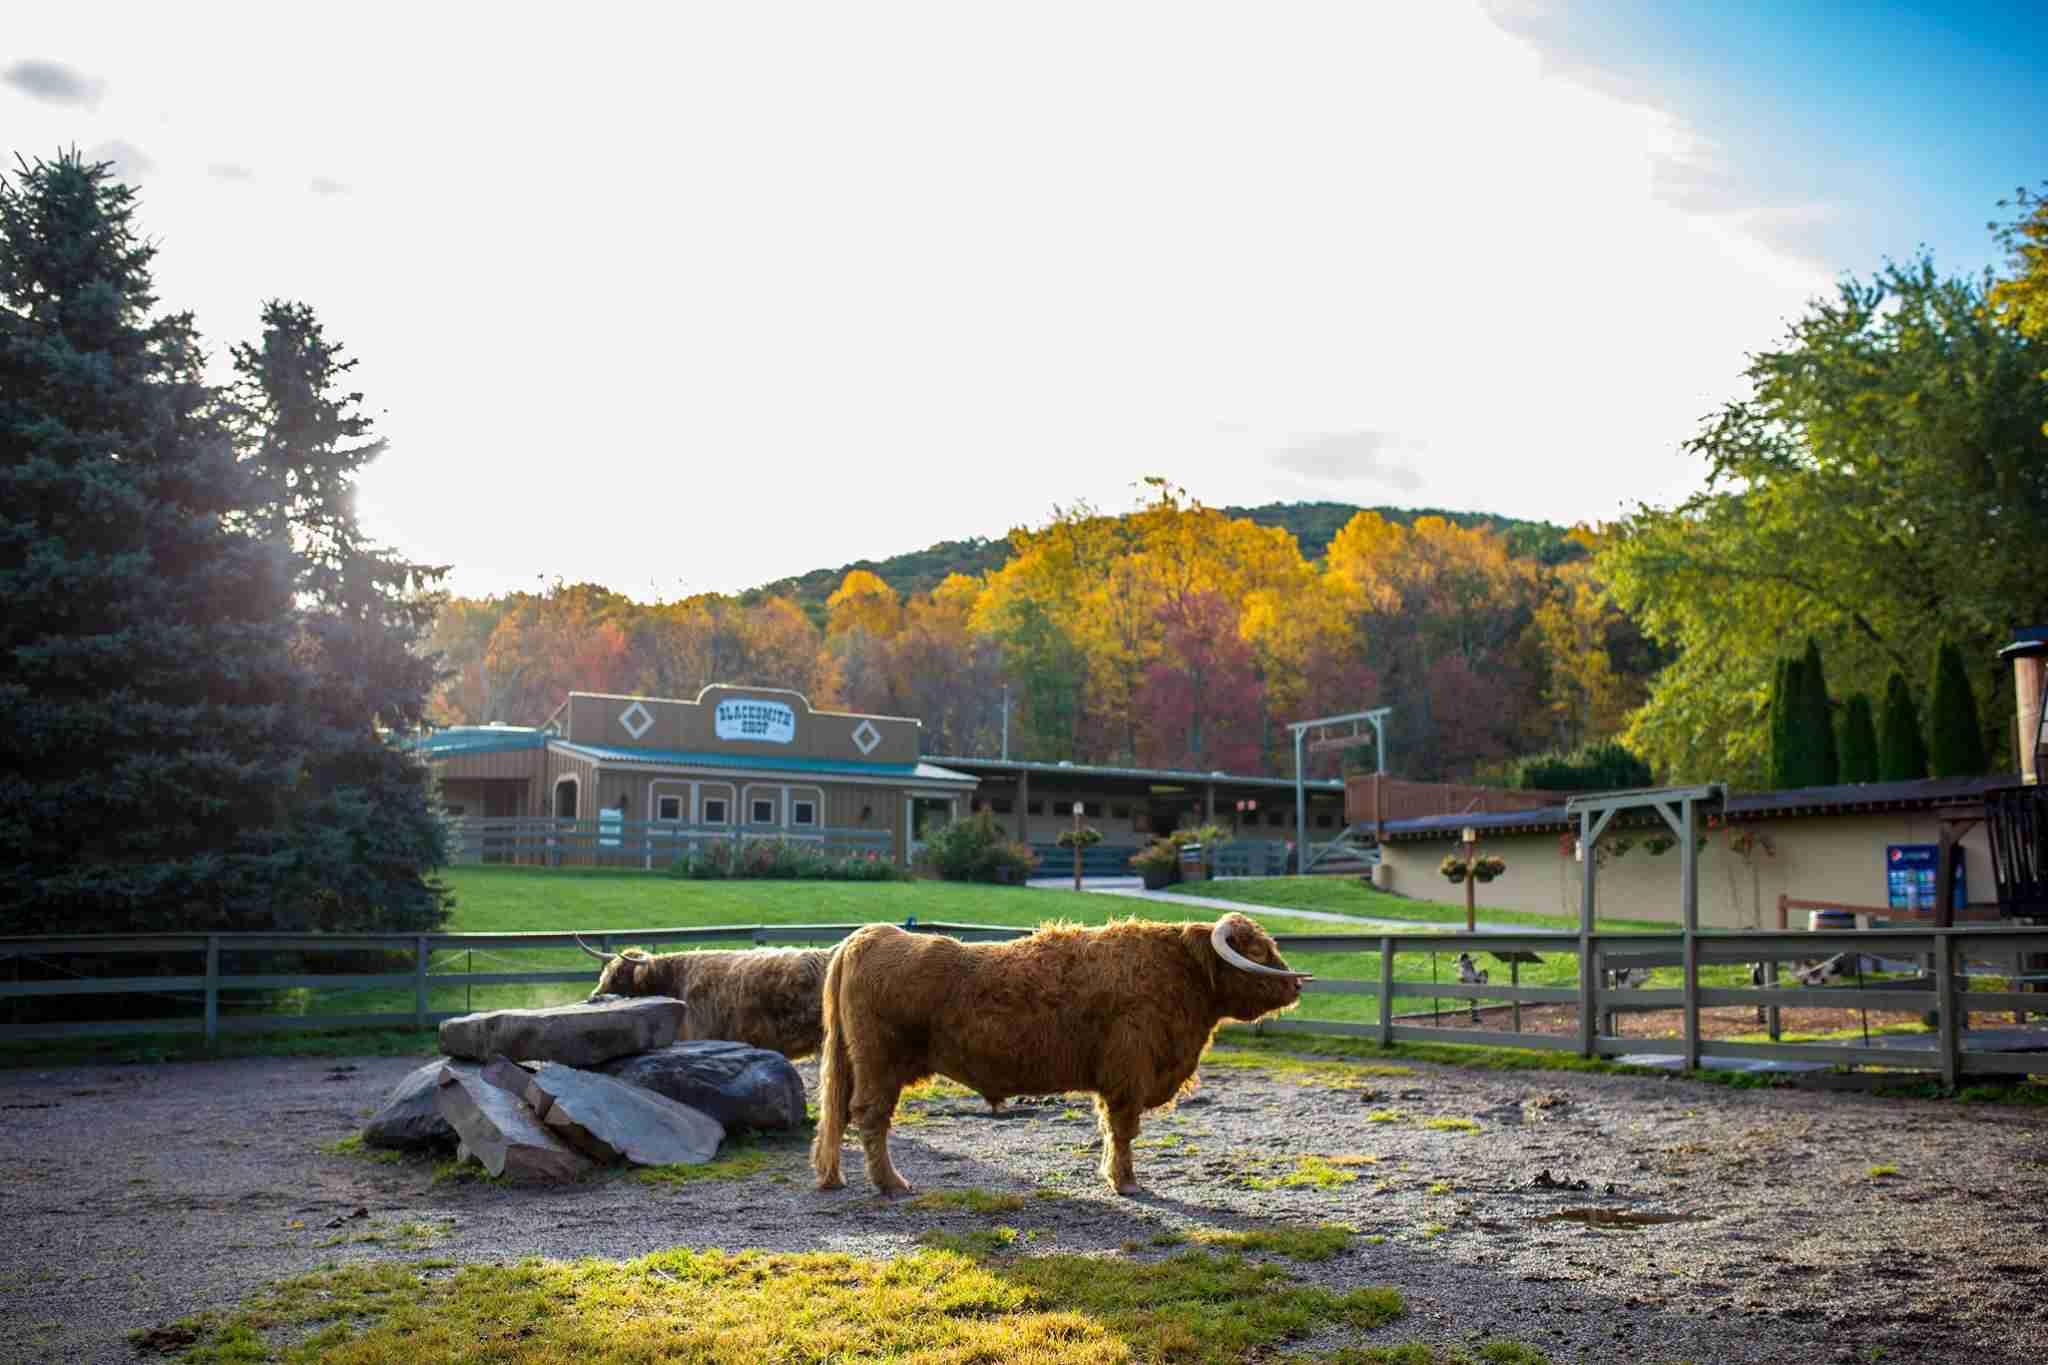 Scottish Higland cattle at Rocking Horse Ranch Resort